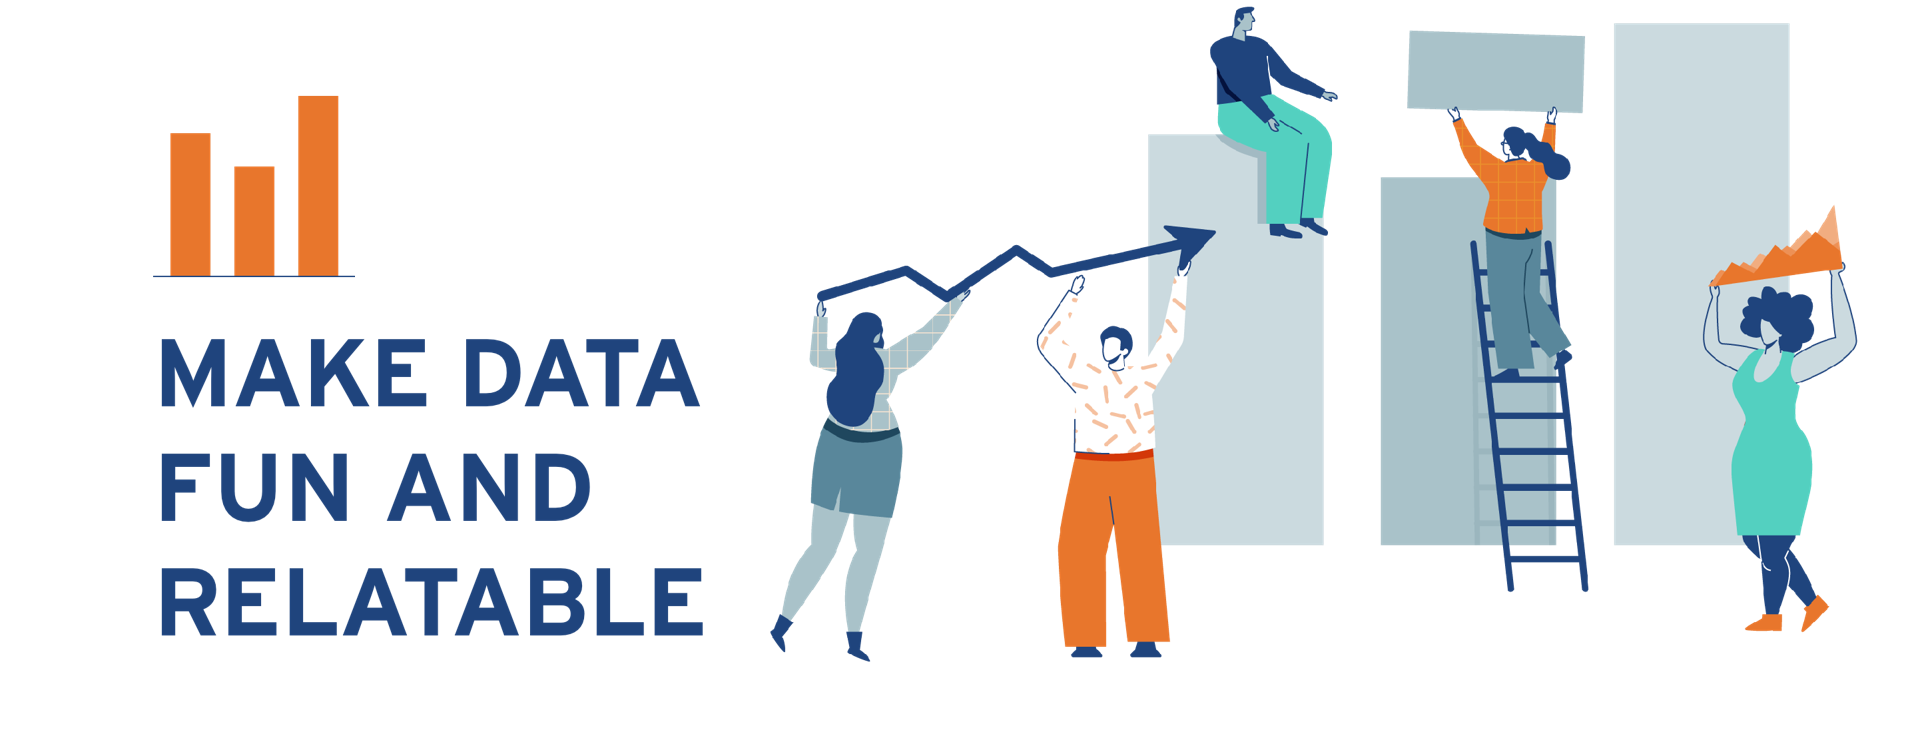 3 make data fun and relatable